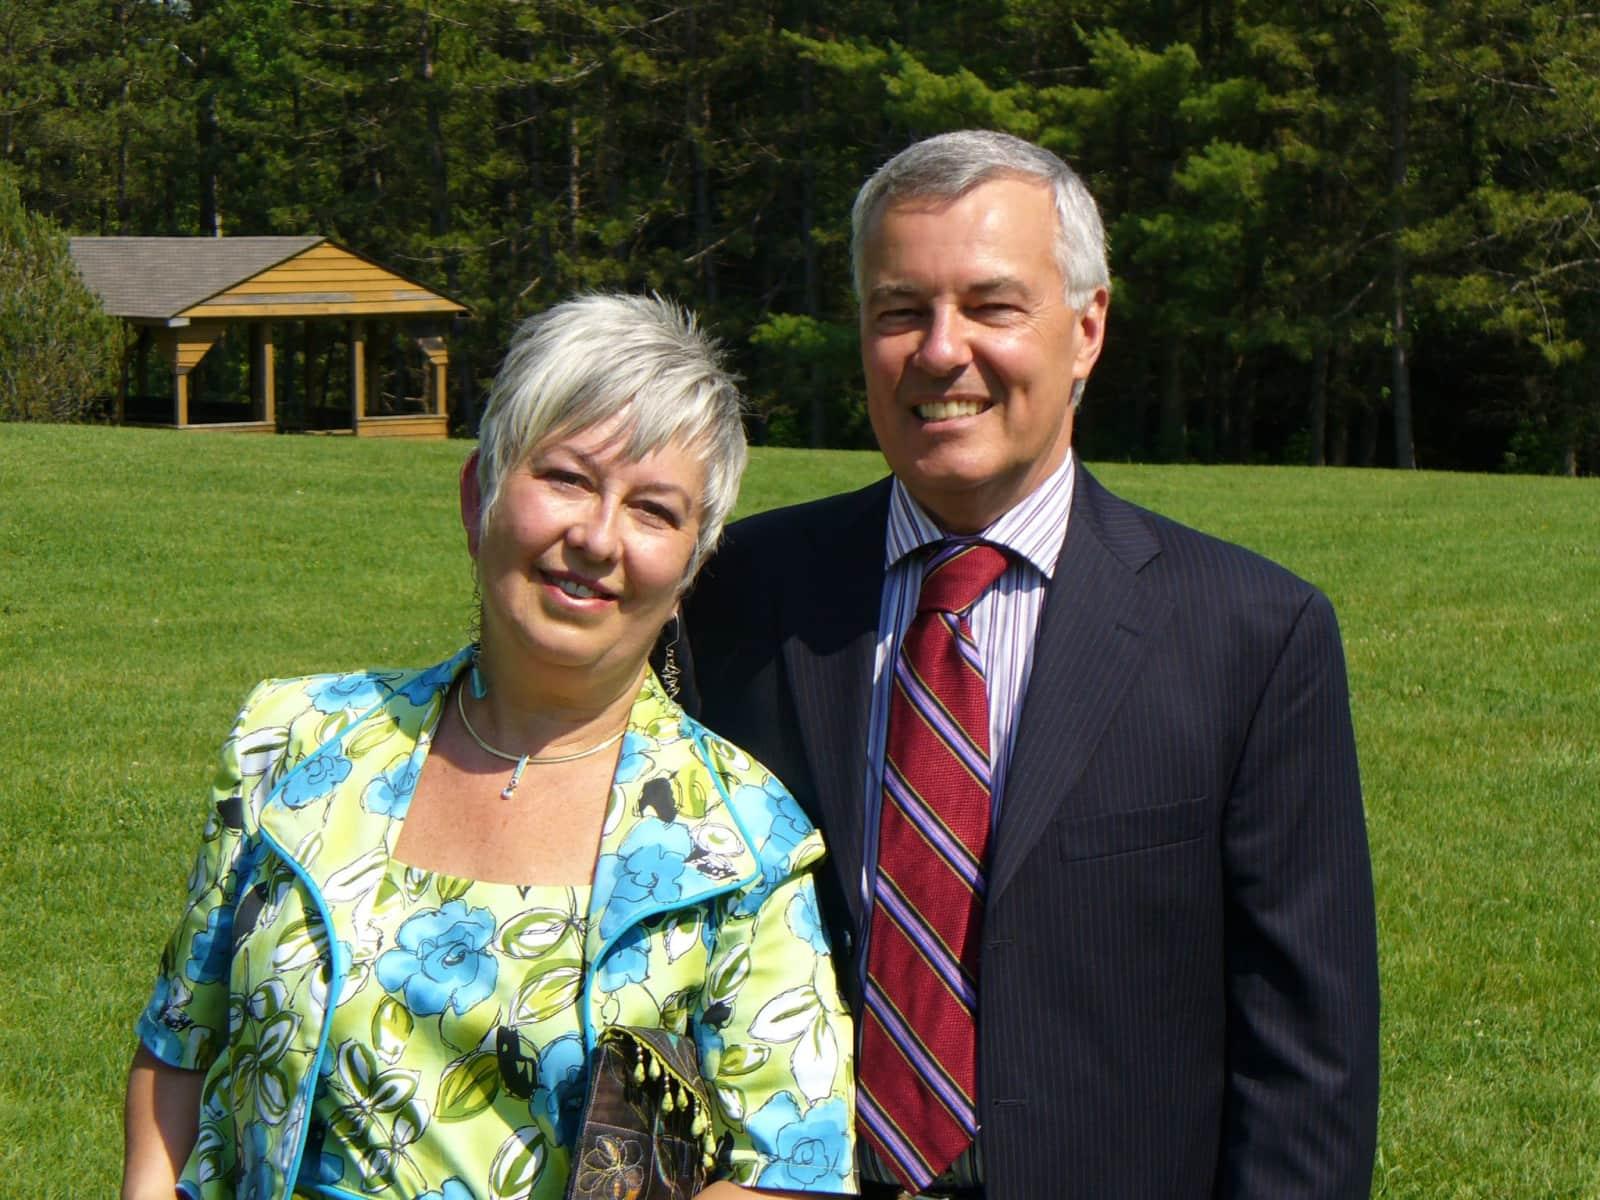 Steve & Marilyn from Orillia, Ontario, Canada